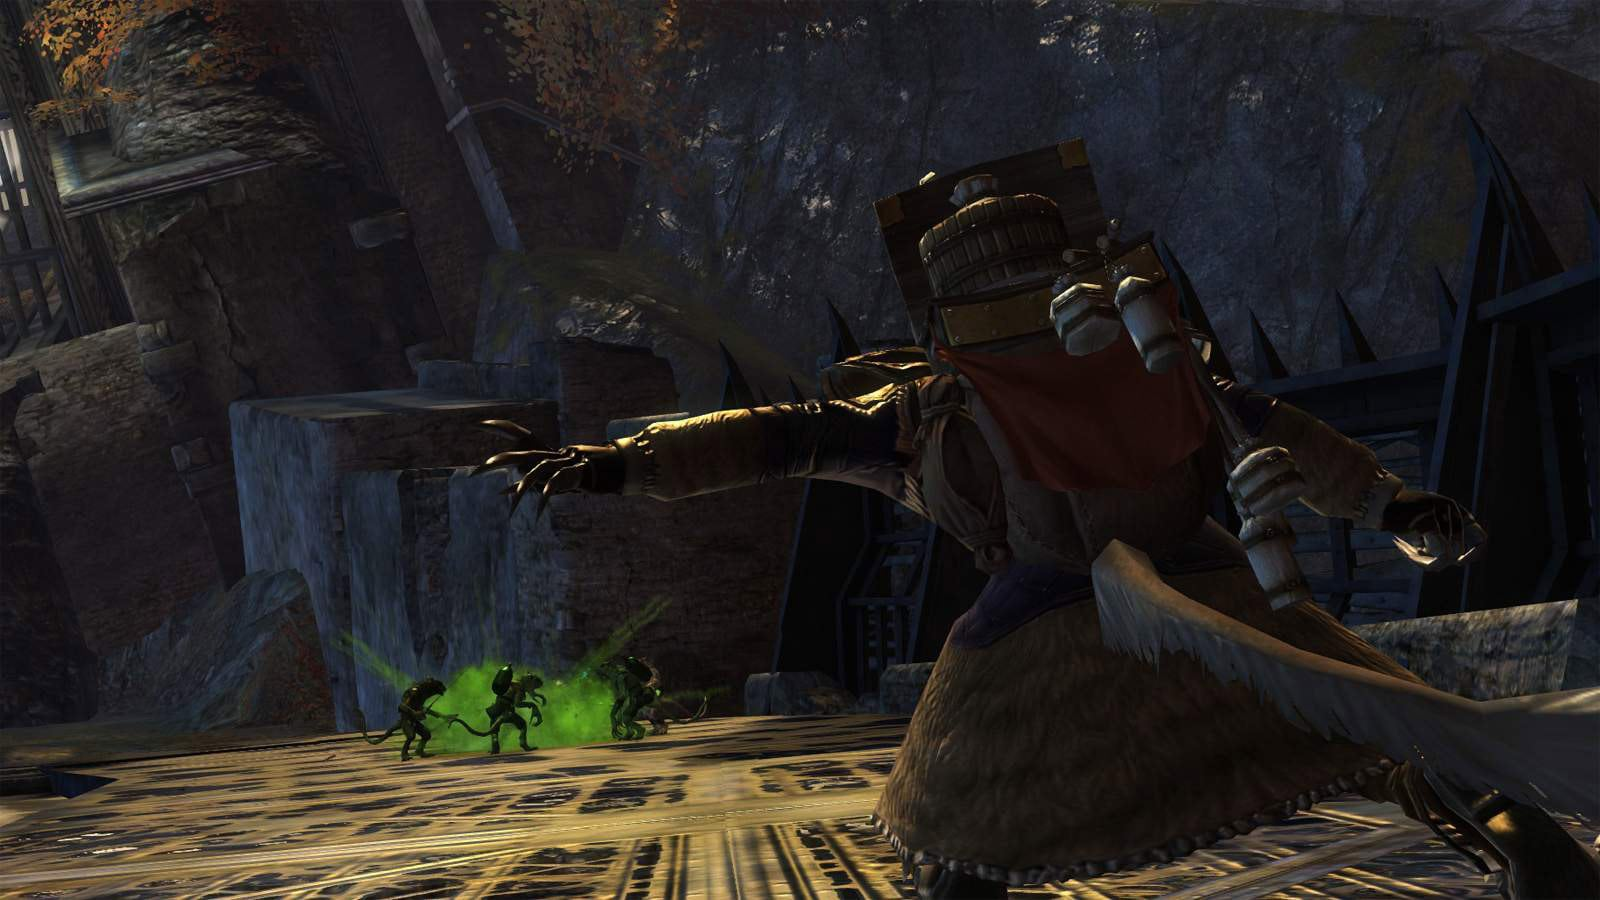 Guild Wars 2 (28.08 релиз) - Другие игры - Prodota.ru forum